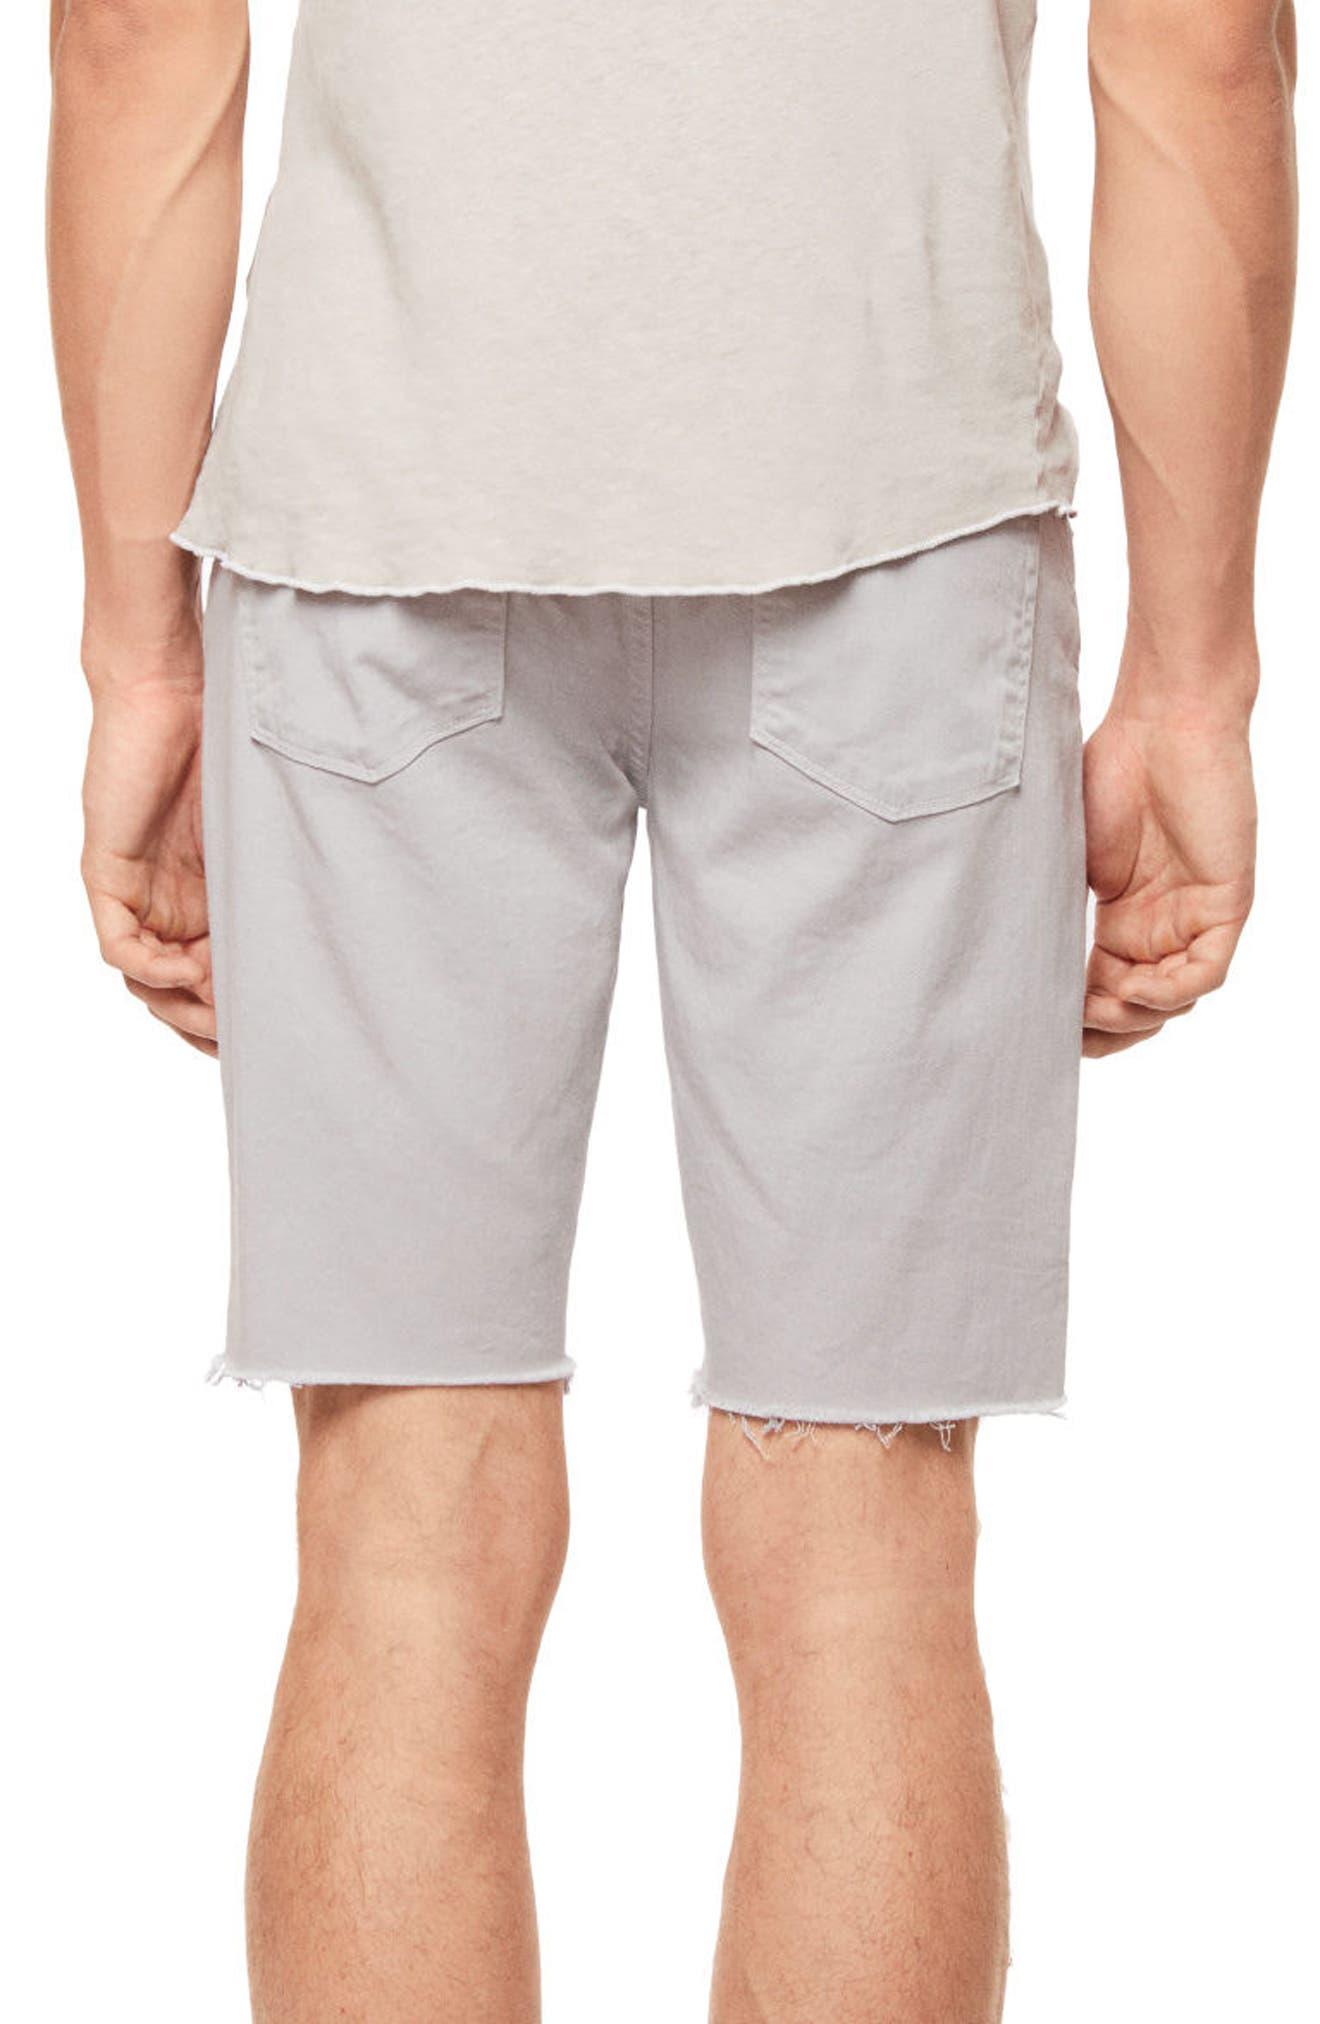 Eli Cutoff Denim Shorts,                             Alternate thumbnail 2, color,                             Reflect